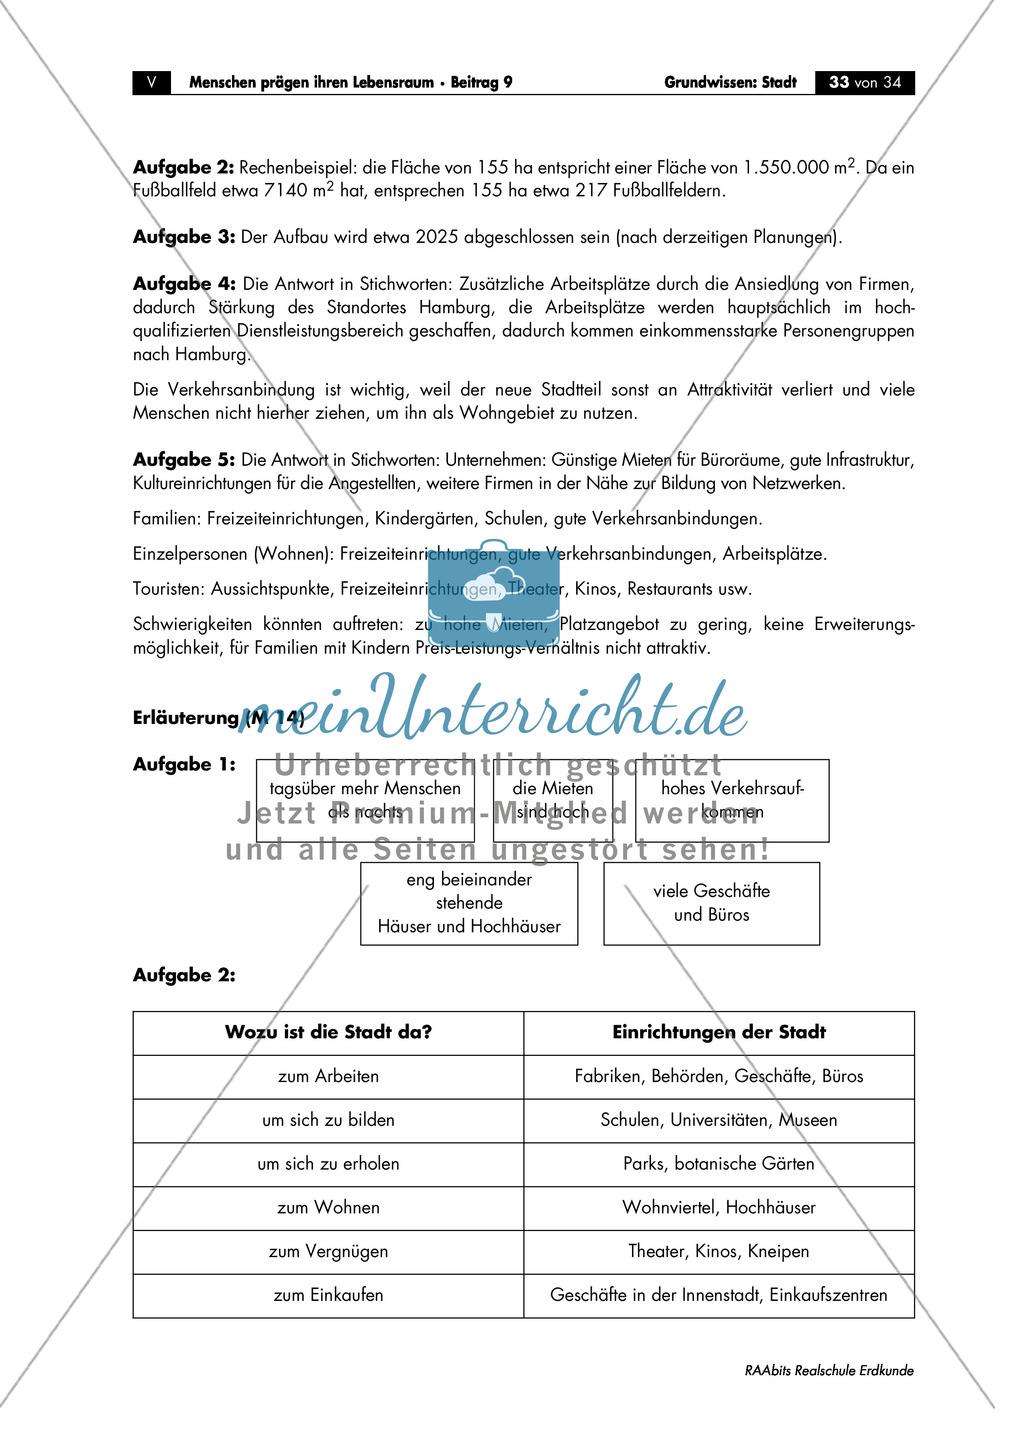 Grundwissen Stadt: Merkmale + Funktionen + Stadtviertel - Lernkontrolle Preview 2